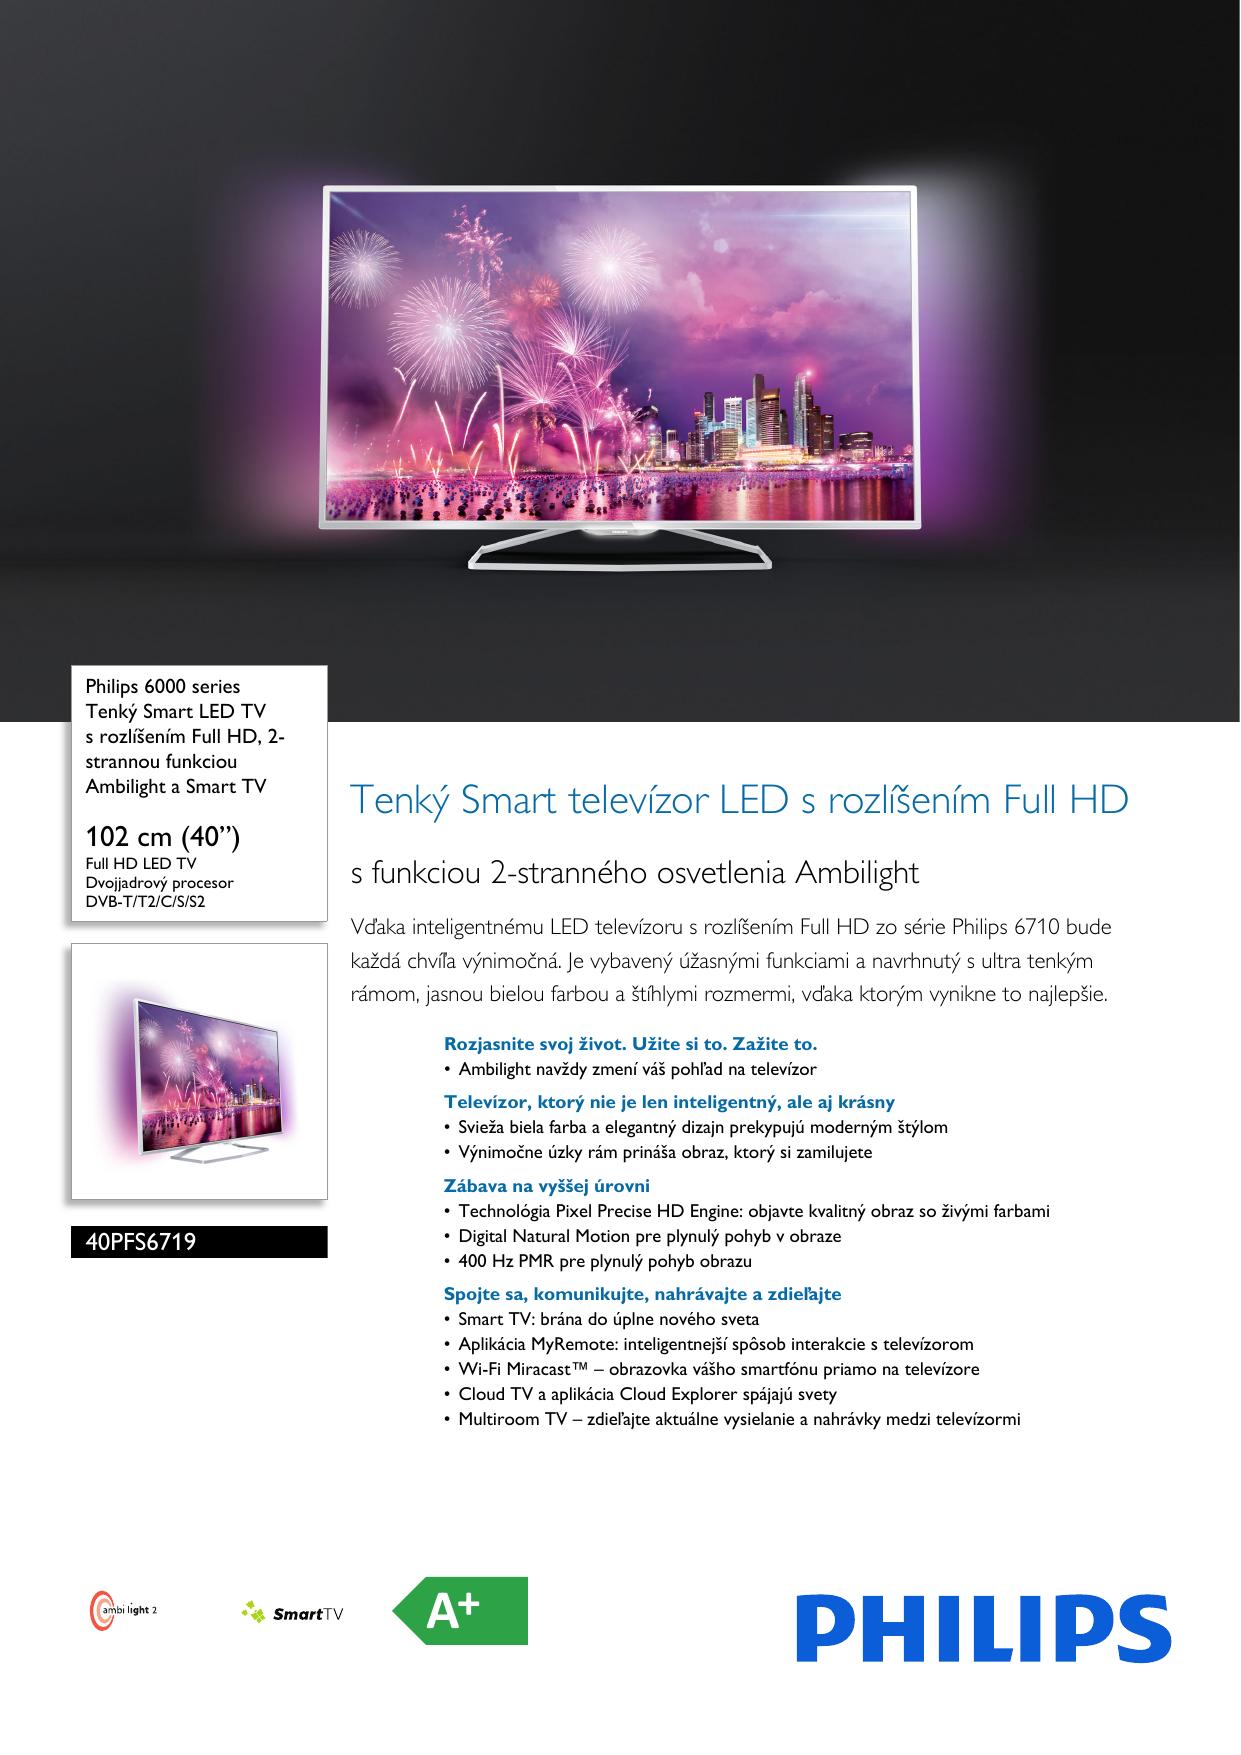 d060a4751 Philips 40PFS6719/12 Leaflet 40PFS6719_12 Released Slovakia (Slovak) User  Manual Prospekt 40pfs6719 12 Pss Slksk